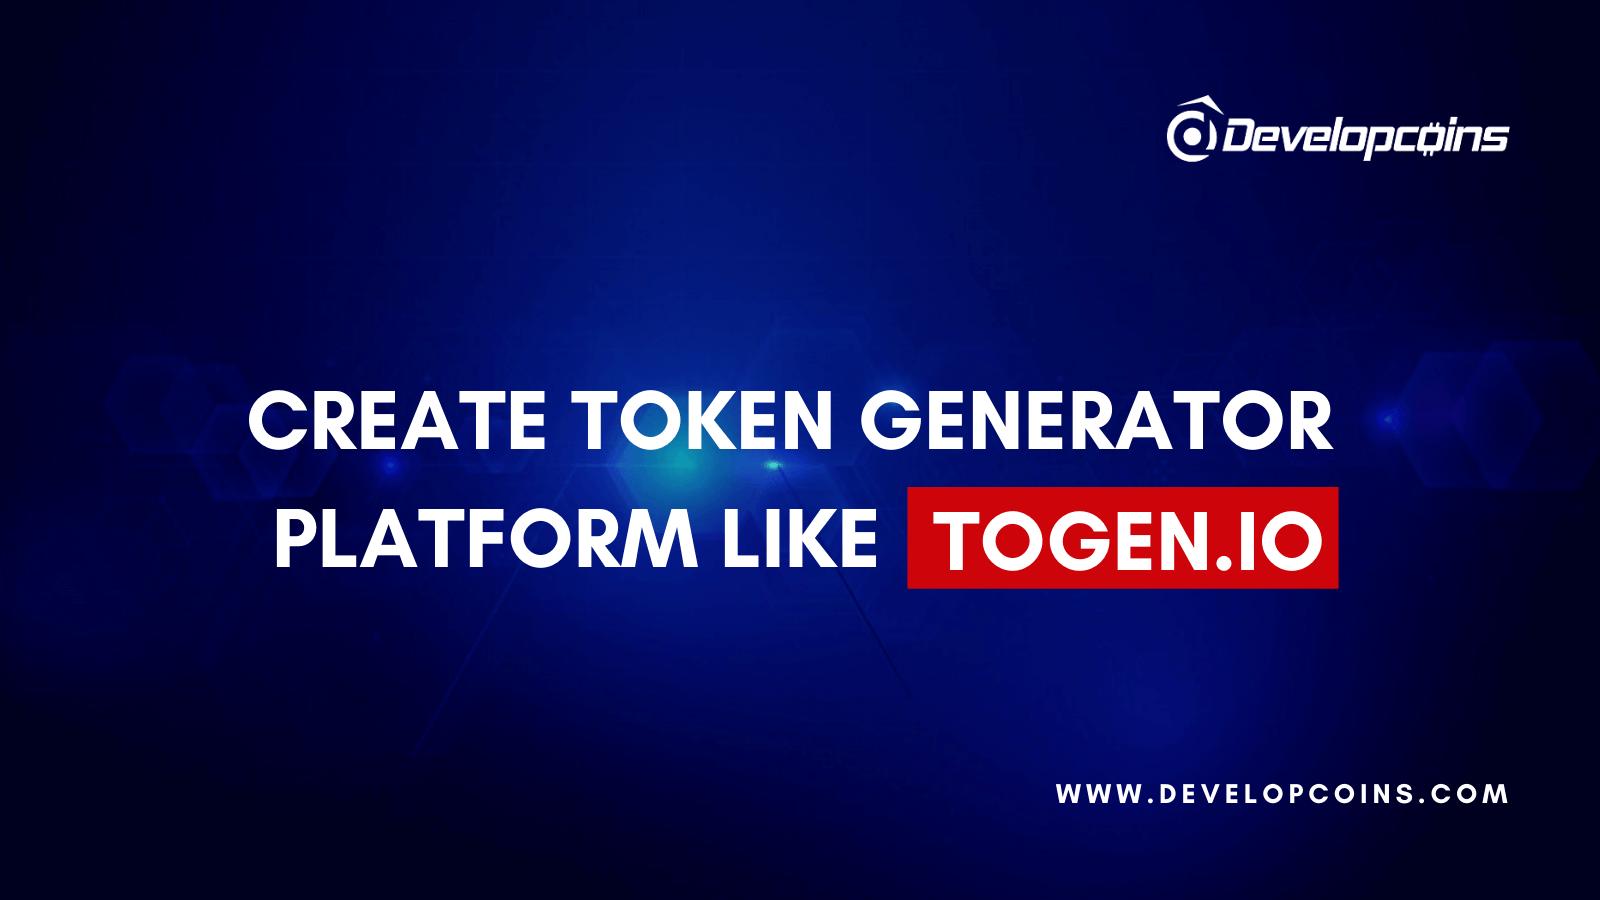 Create A Ethereum Token Generator Platform like Togen   Developcoins